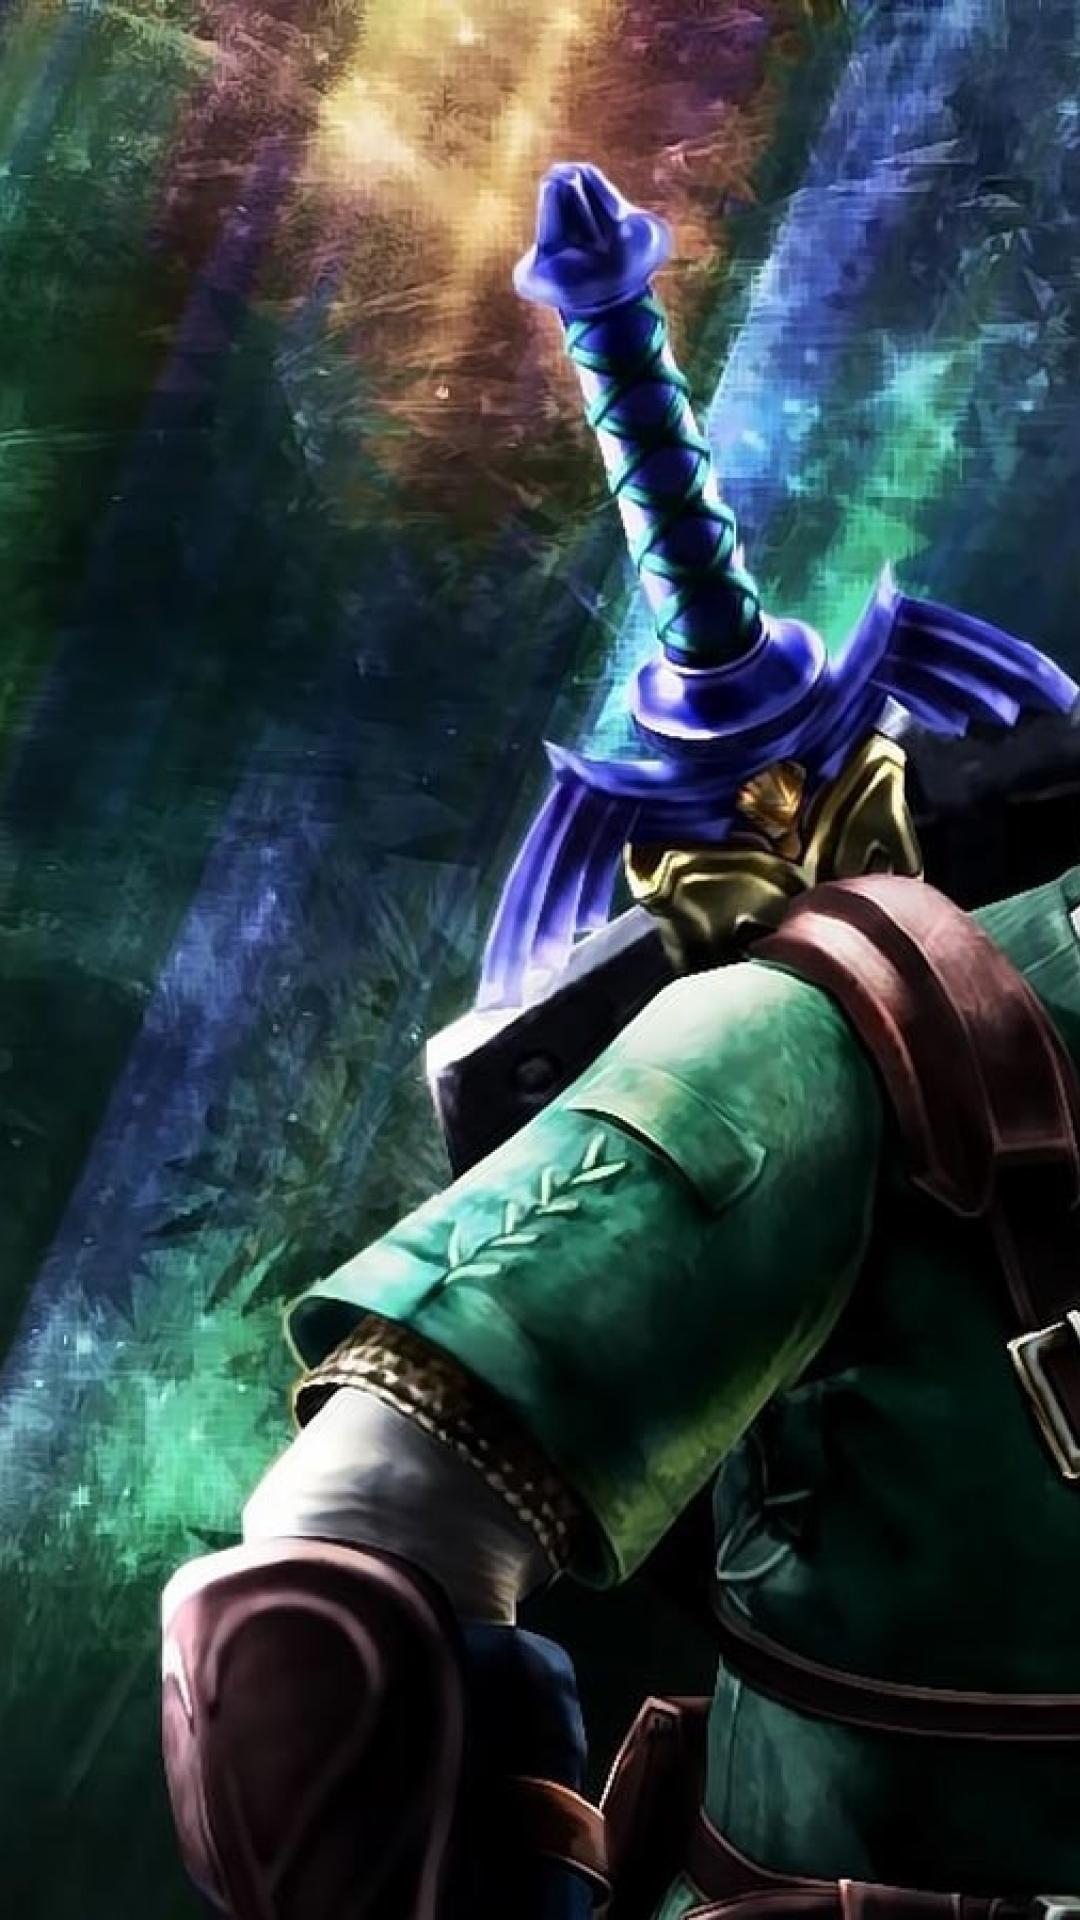 Legend Of Zelda Wallpaper For Android Posted By John Walker